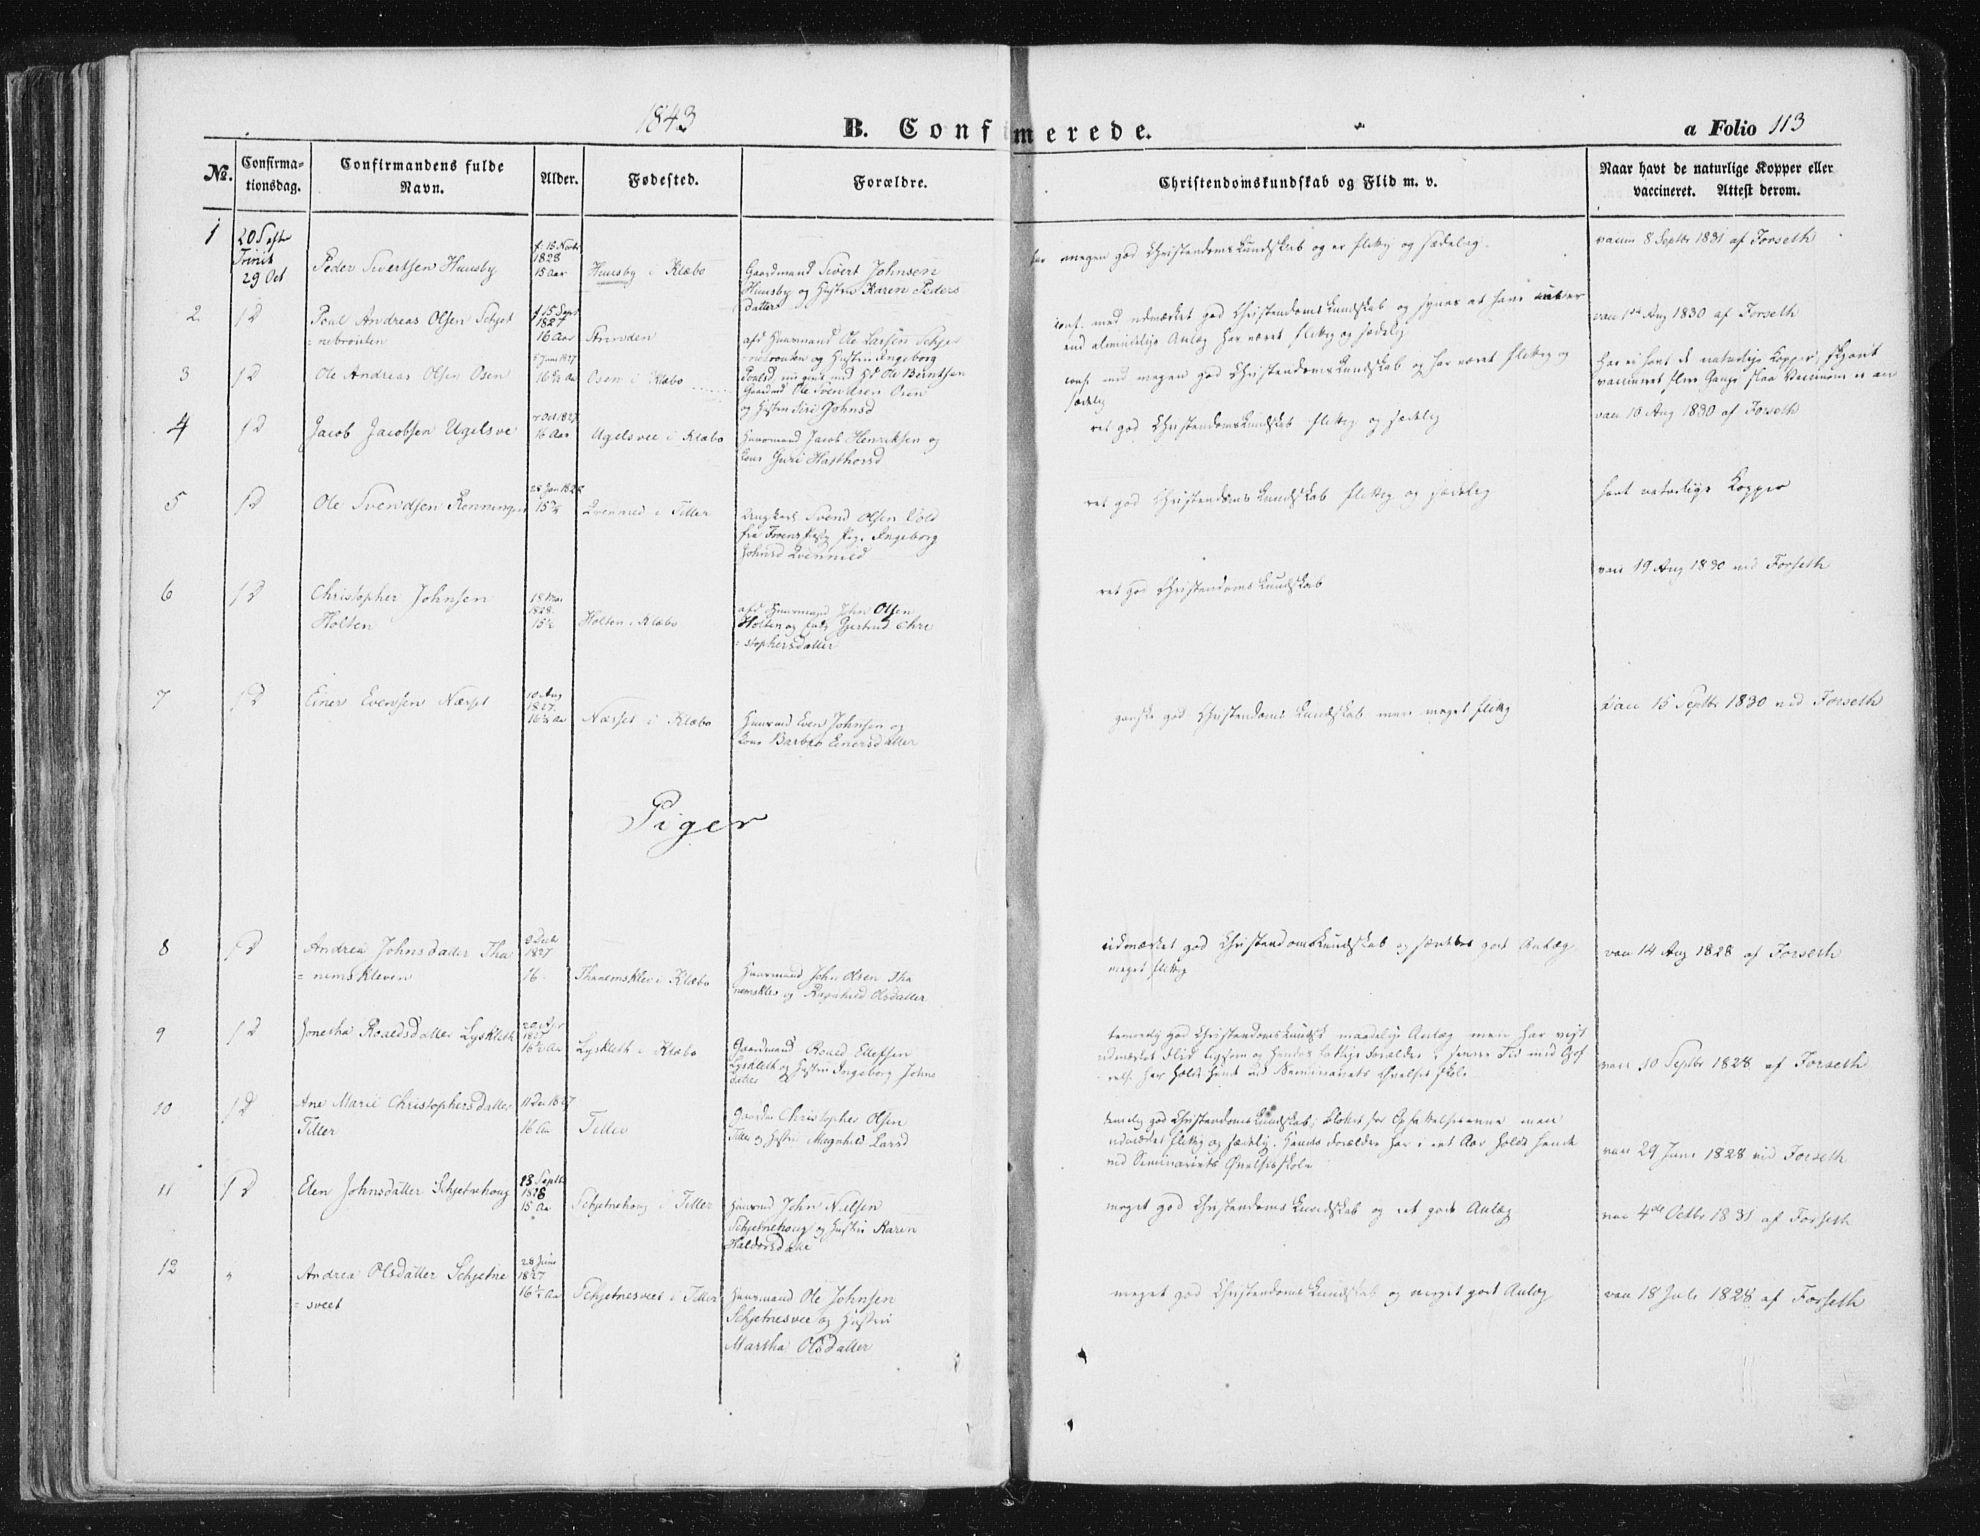 SAT, Ministerialprotokoller, klokkerbøker og fødselsregistre - Sør-Trøndelag, 618/L0441: Parish register (official) no. 618A05, 1843-1862, p. 113